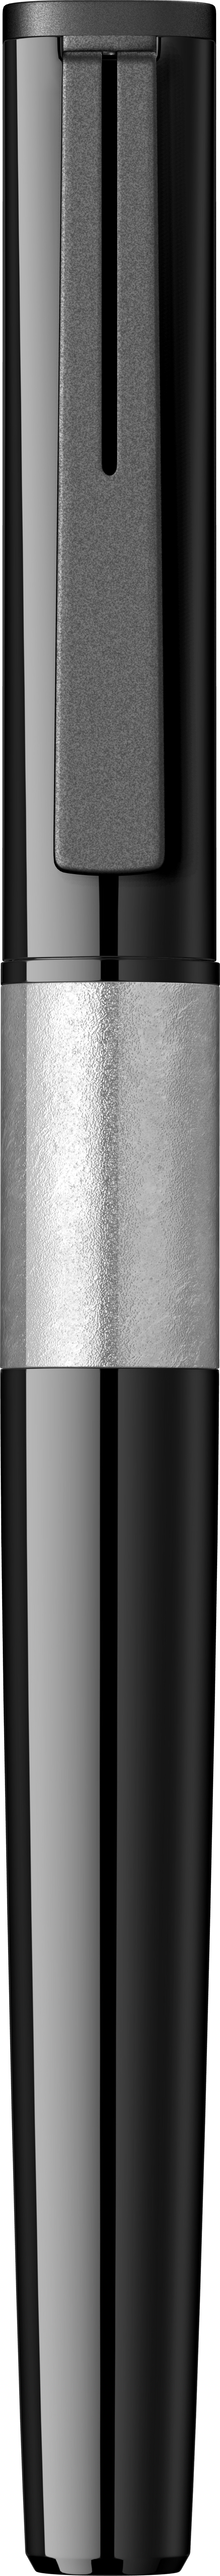 Platinum BT-5037